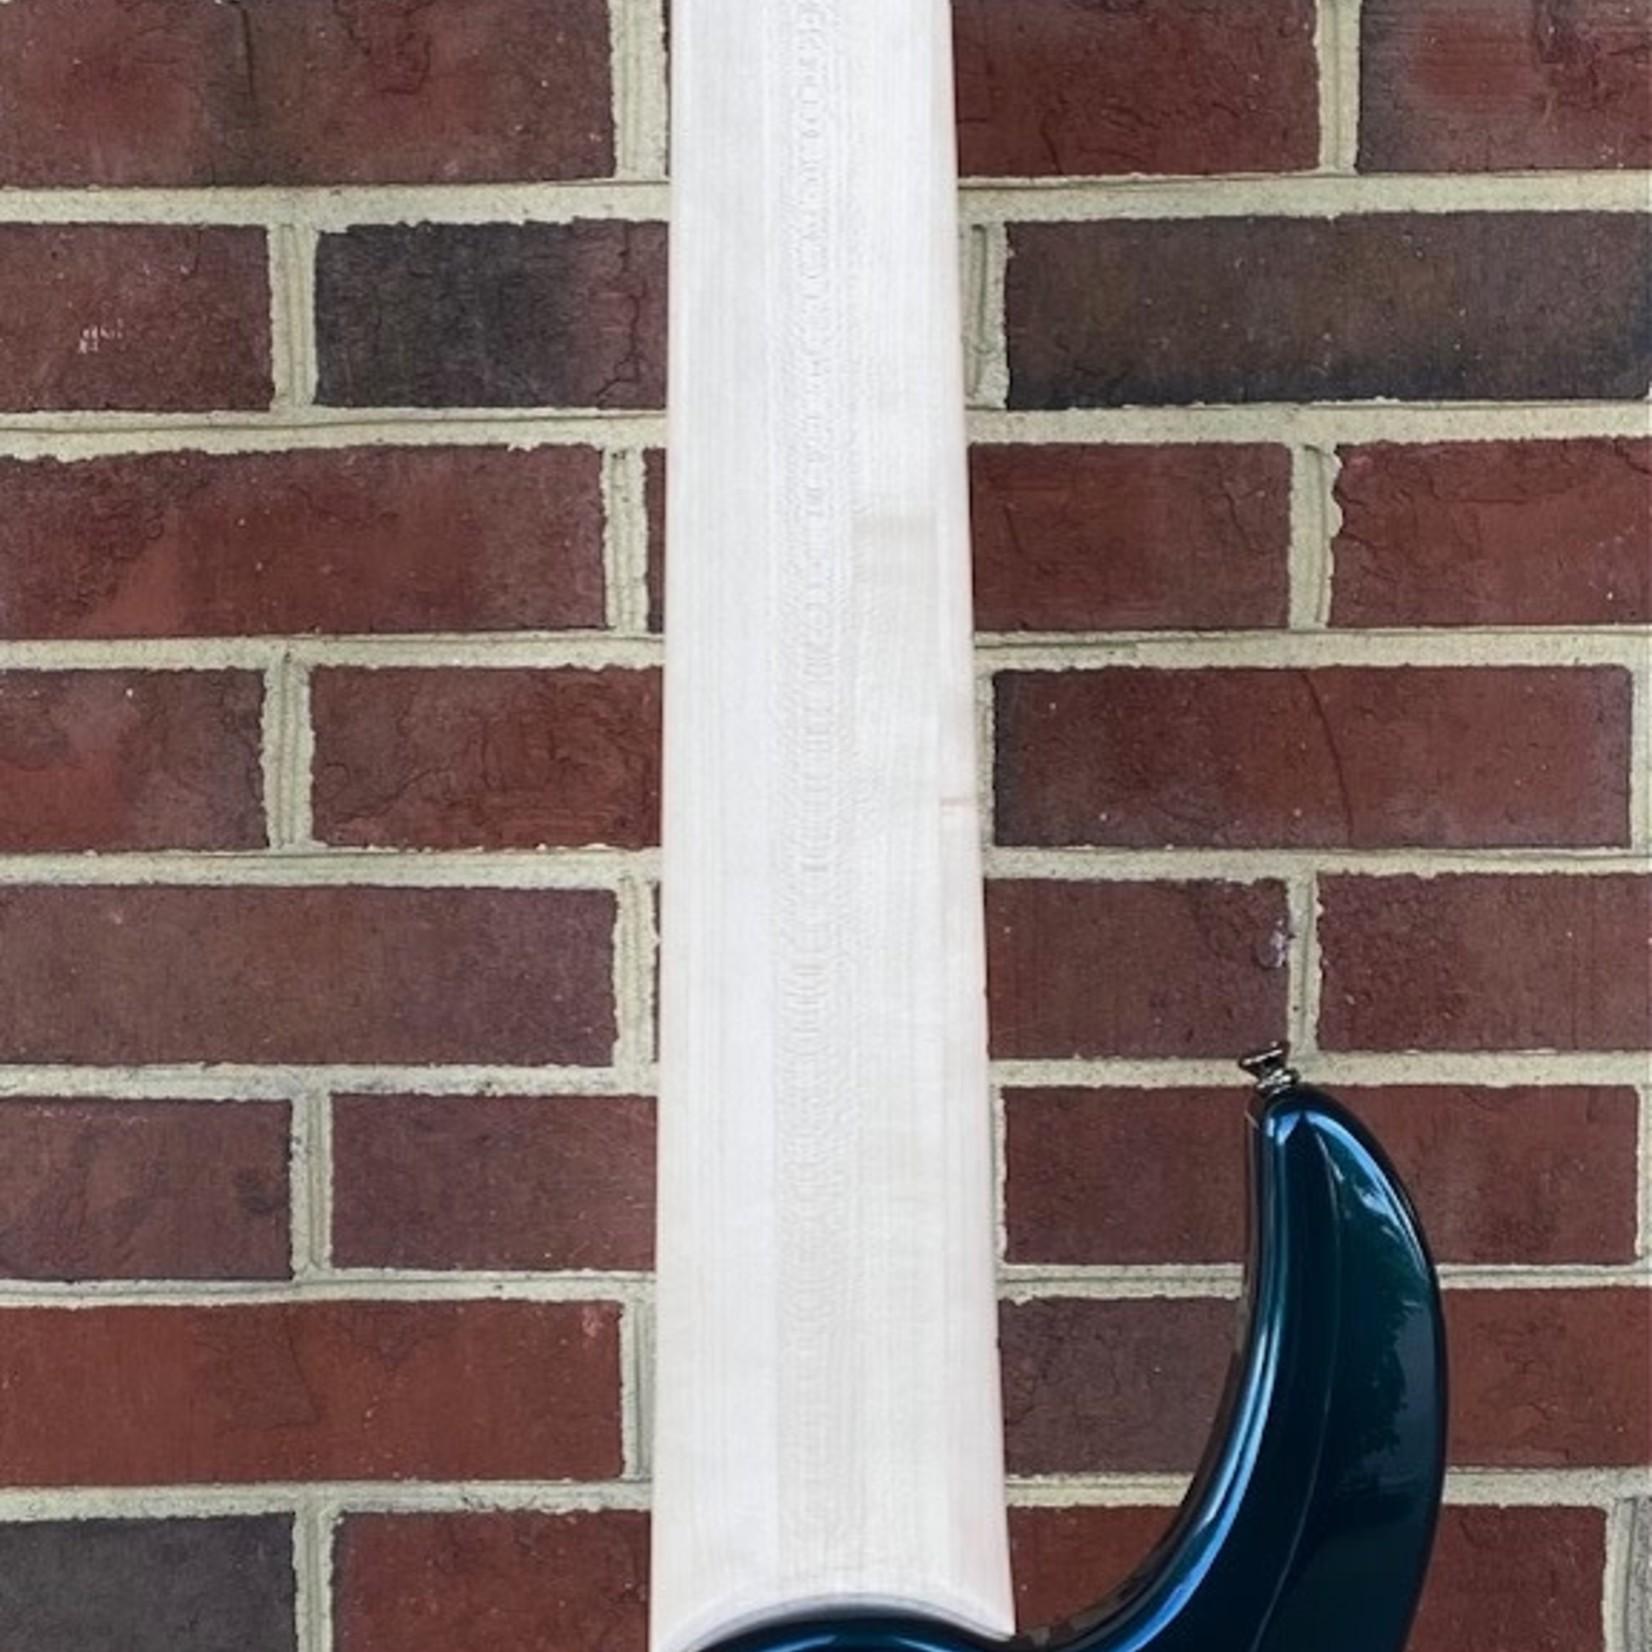 Dingwall Dingwall NG3 6-String, Gloss Black Forest Green, Maple Fretboard, Matching Headstock, Dingwall Gig Bag, SN# 9483